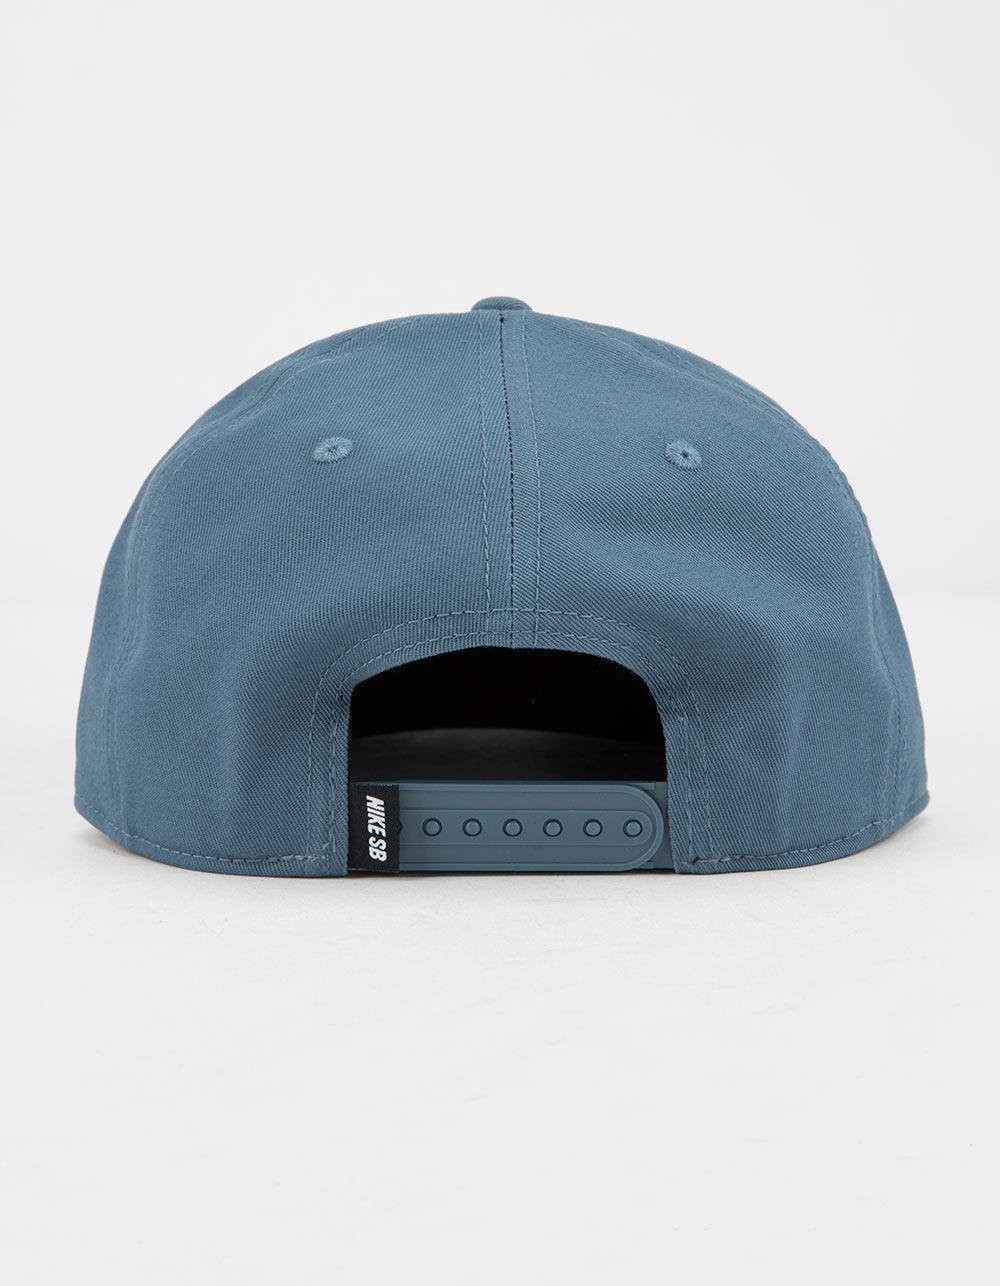 fd6e4e736c6c8 Nike Pro Vintage Mens Snapback Hat in Blue for Men - Lyst